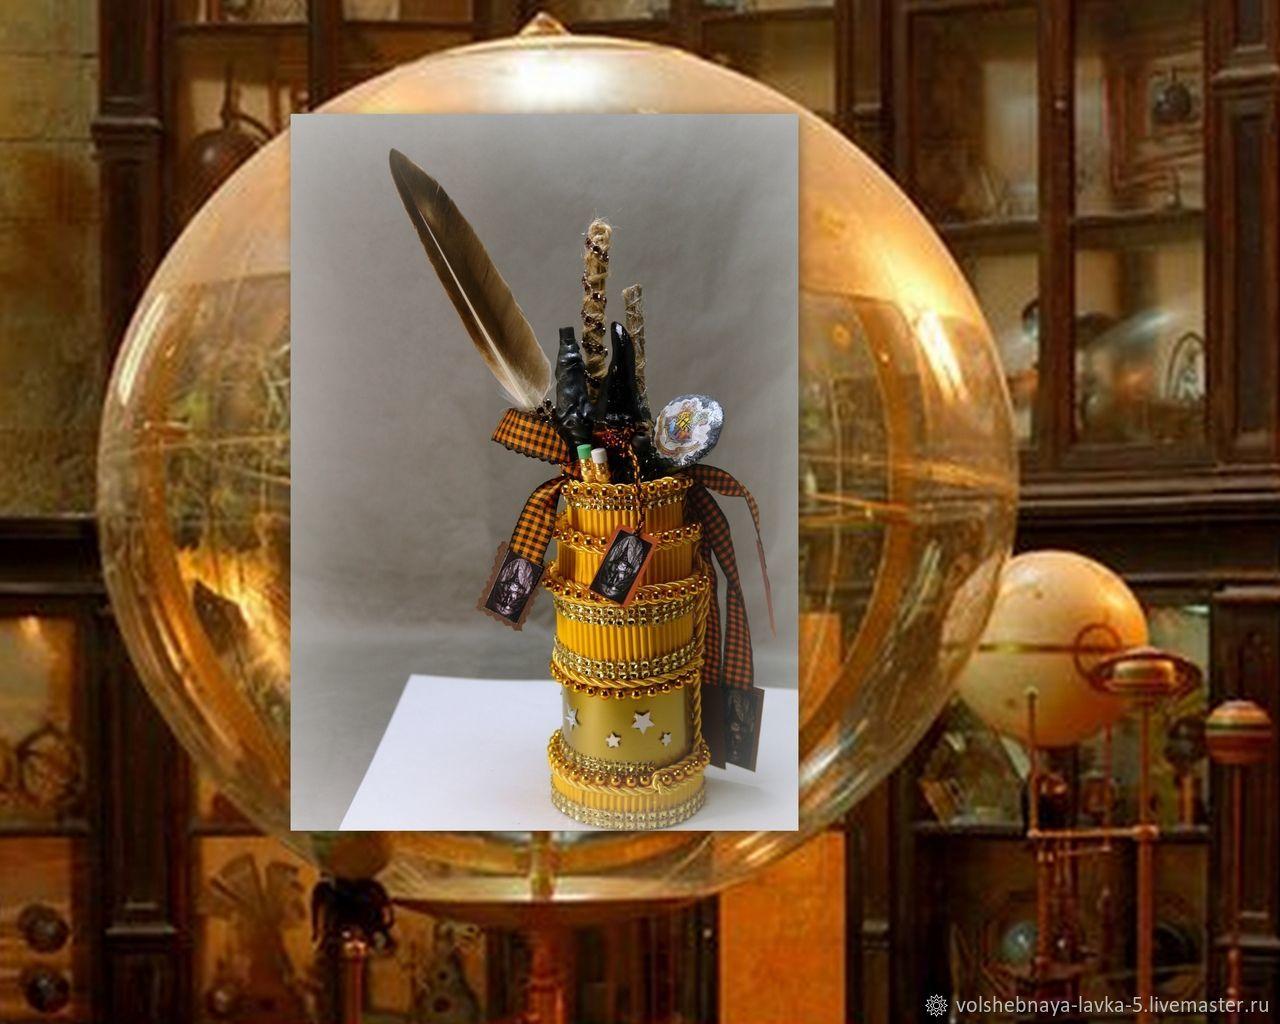 Pencil Holder ' Telescope', Pencil holders, St. Petersburg,  Фото №1